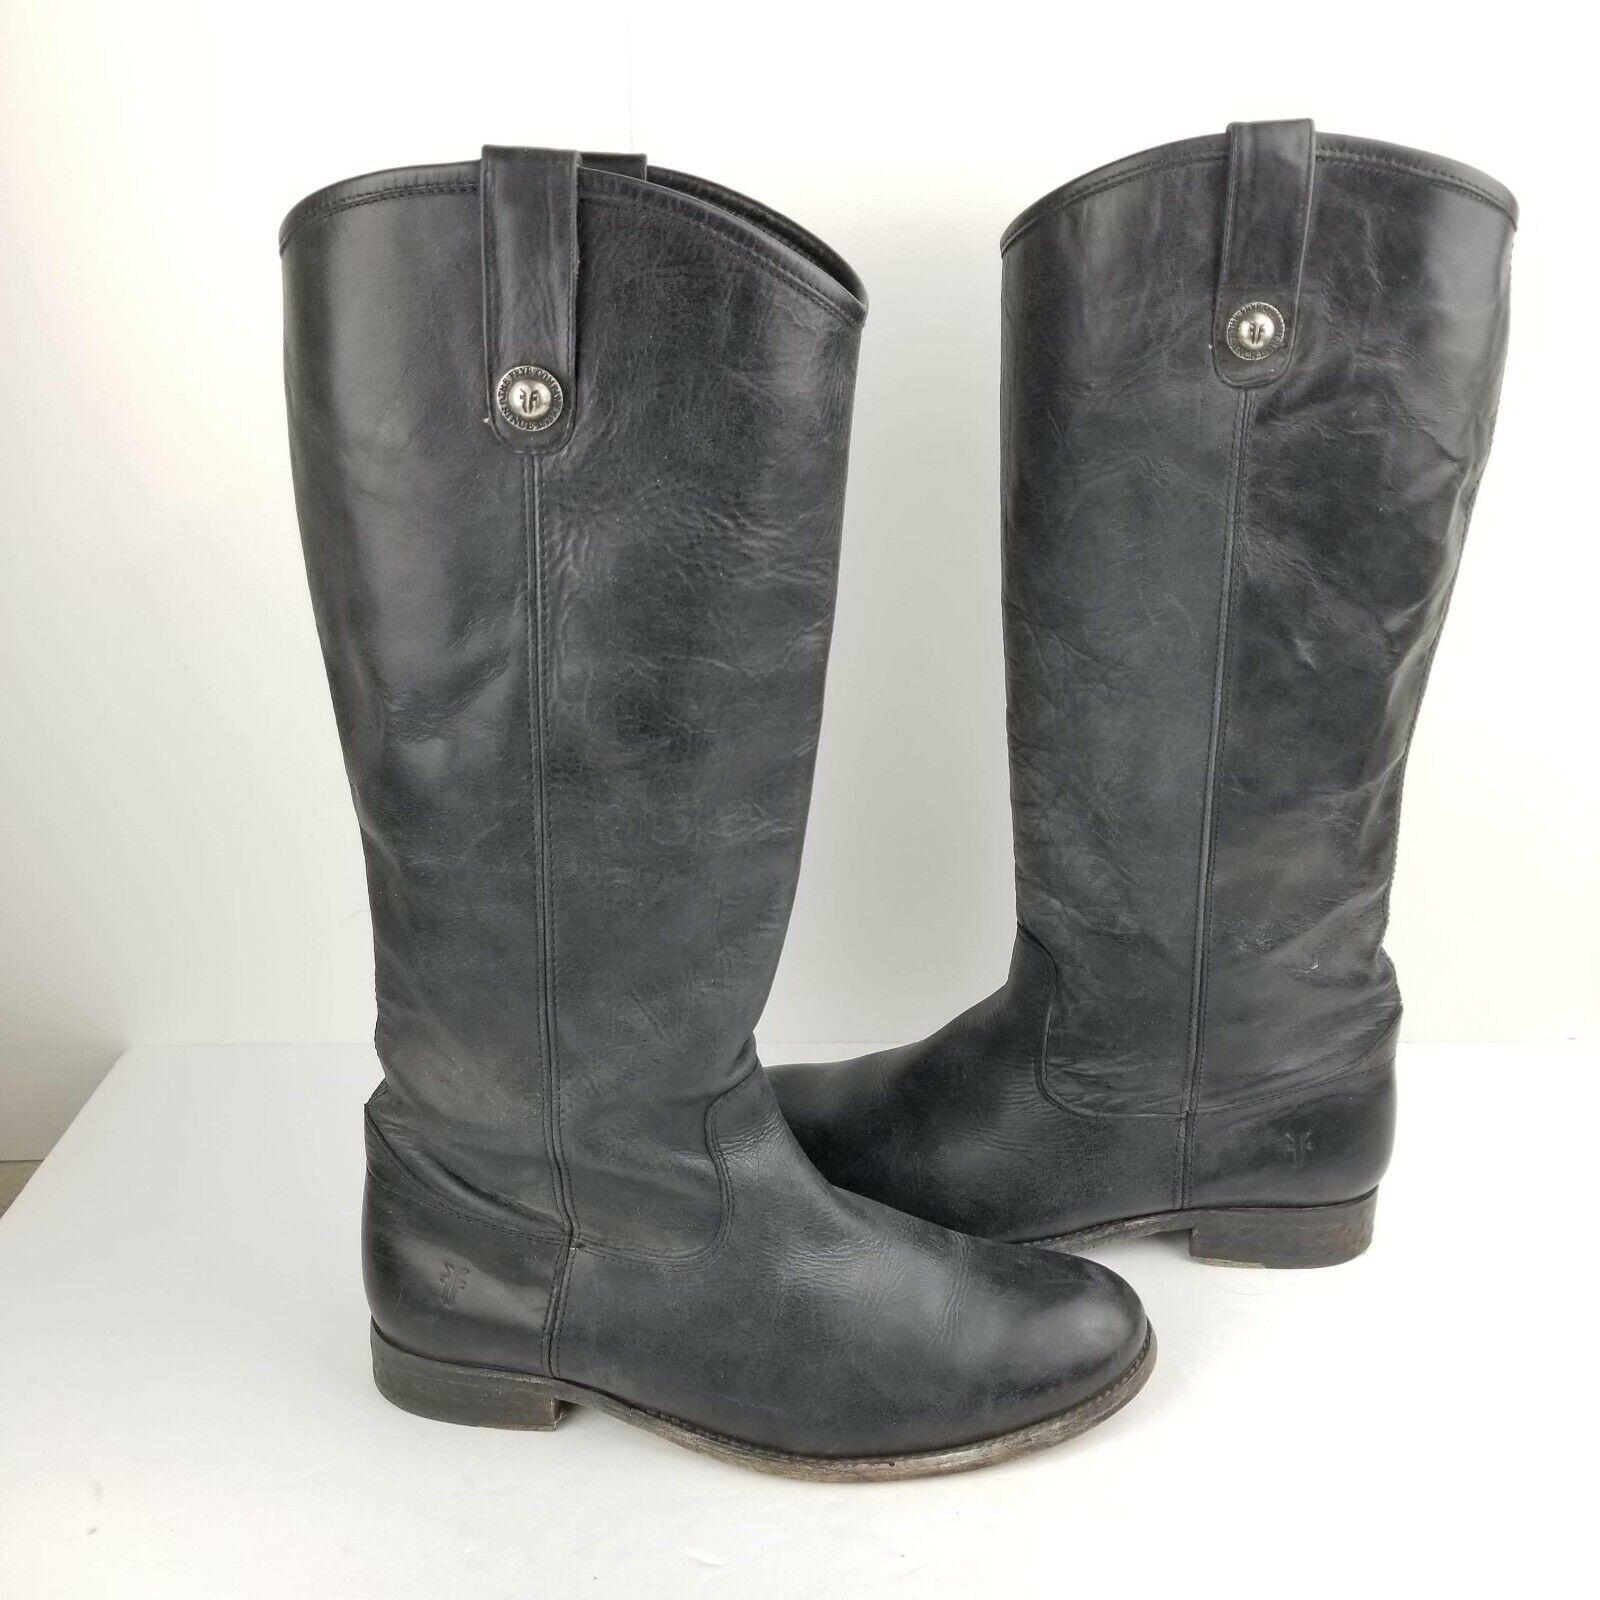 Frye Melissa Women's Black leather Size 10 B Mid calf button logo Boots